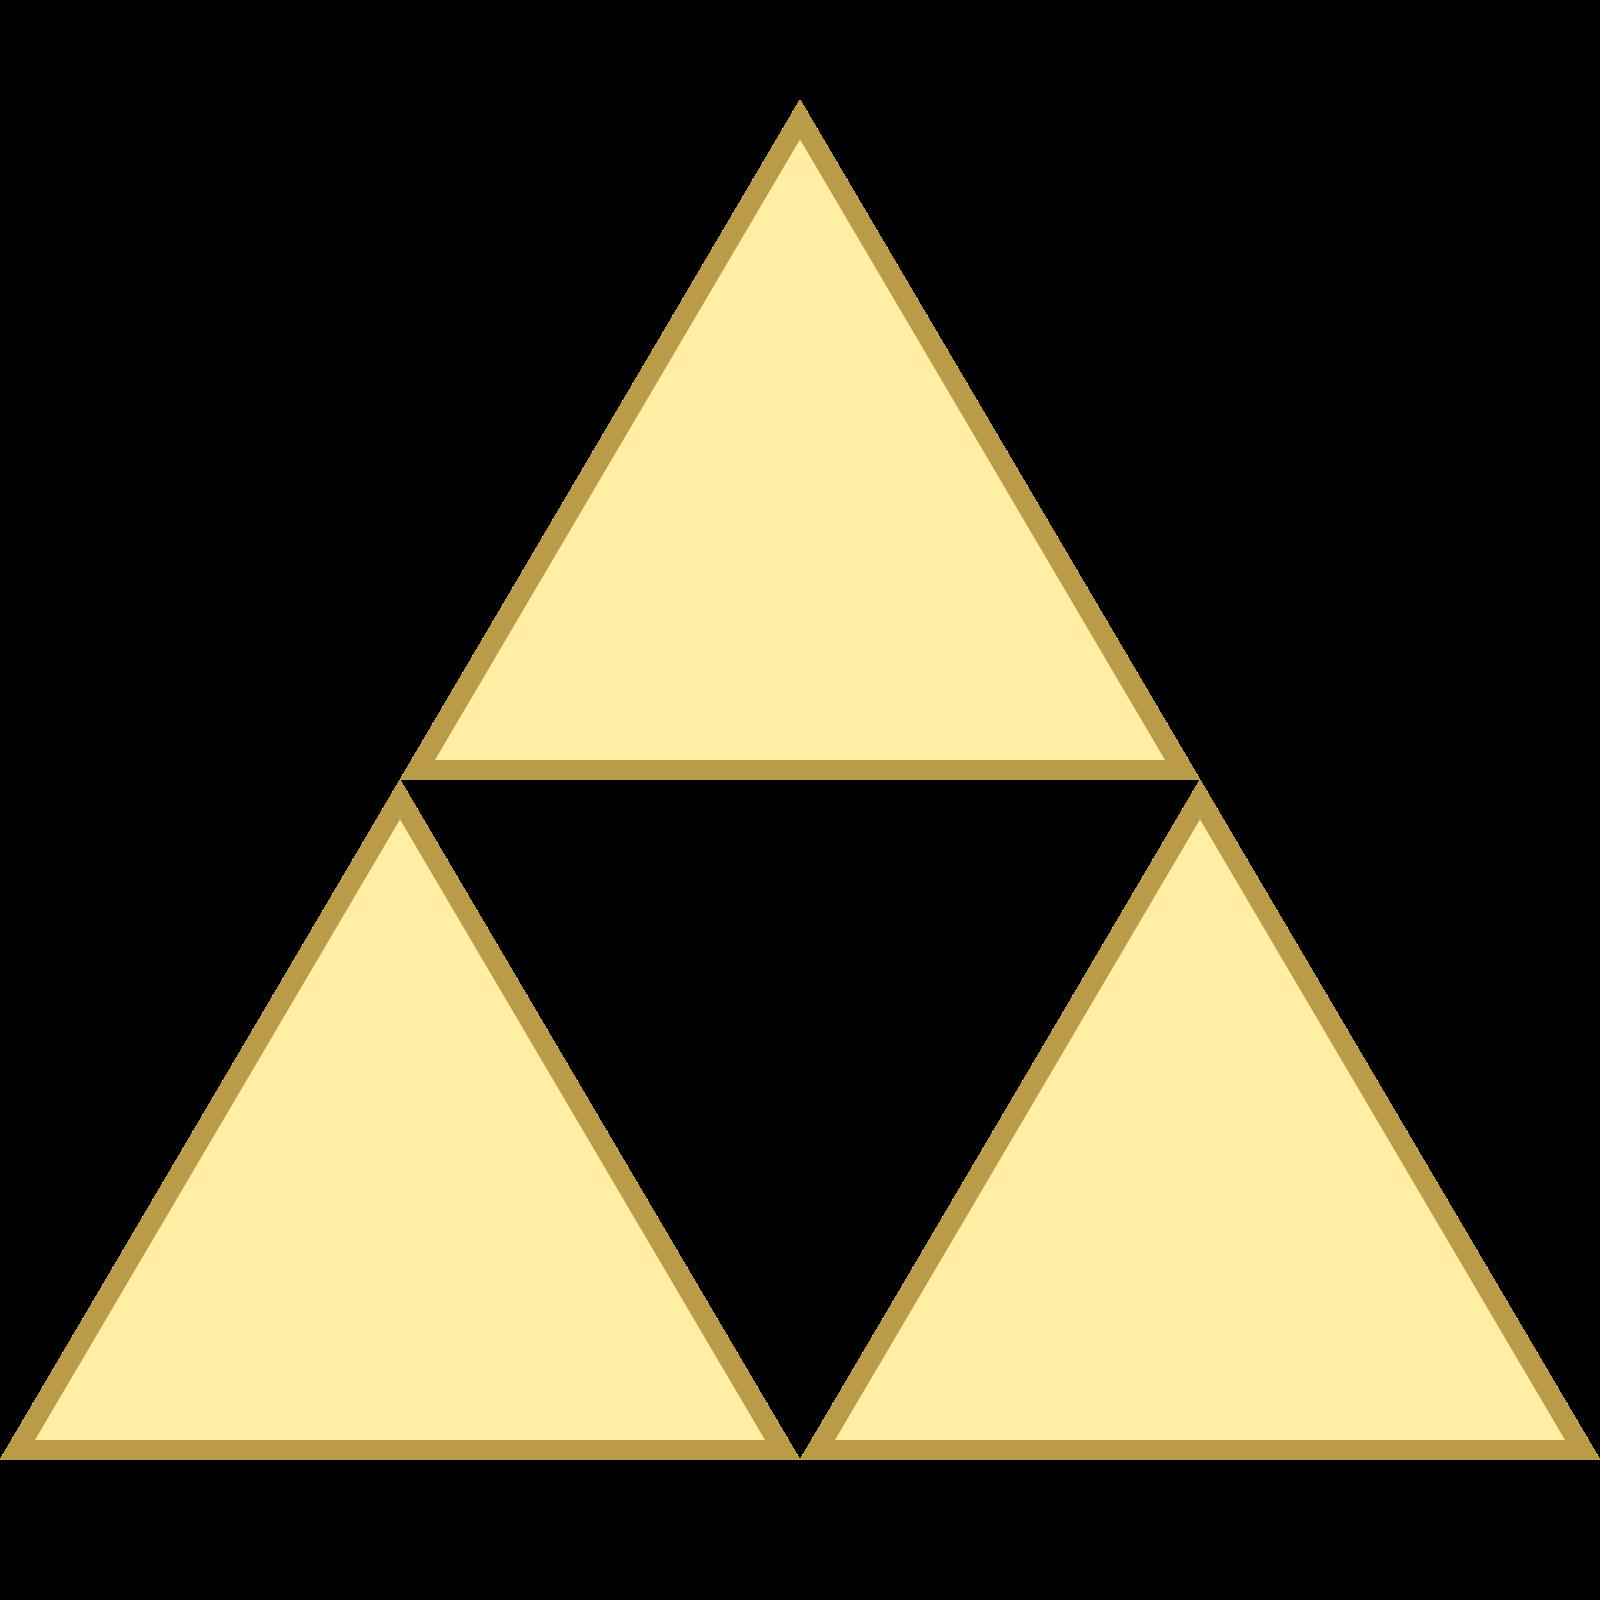 1600x1600 Triforce Icono